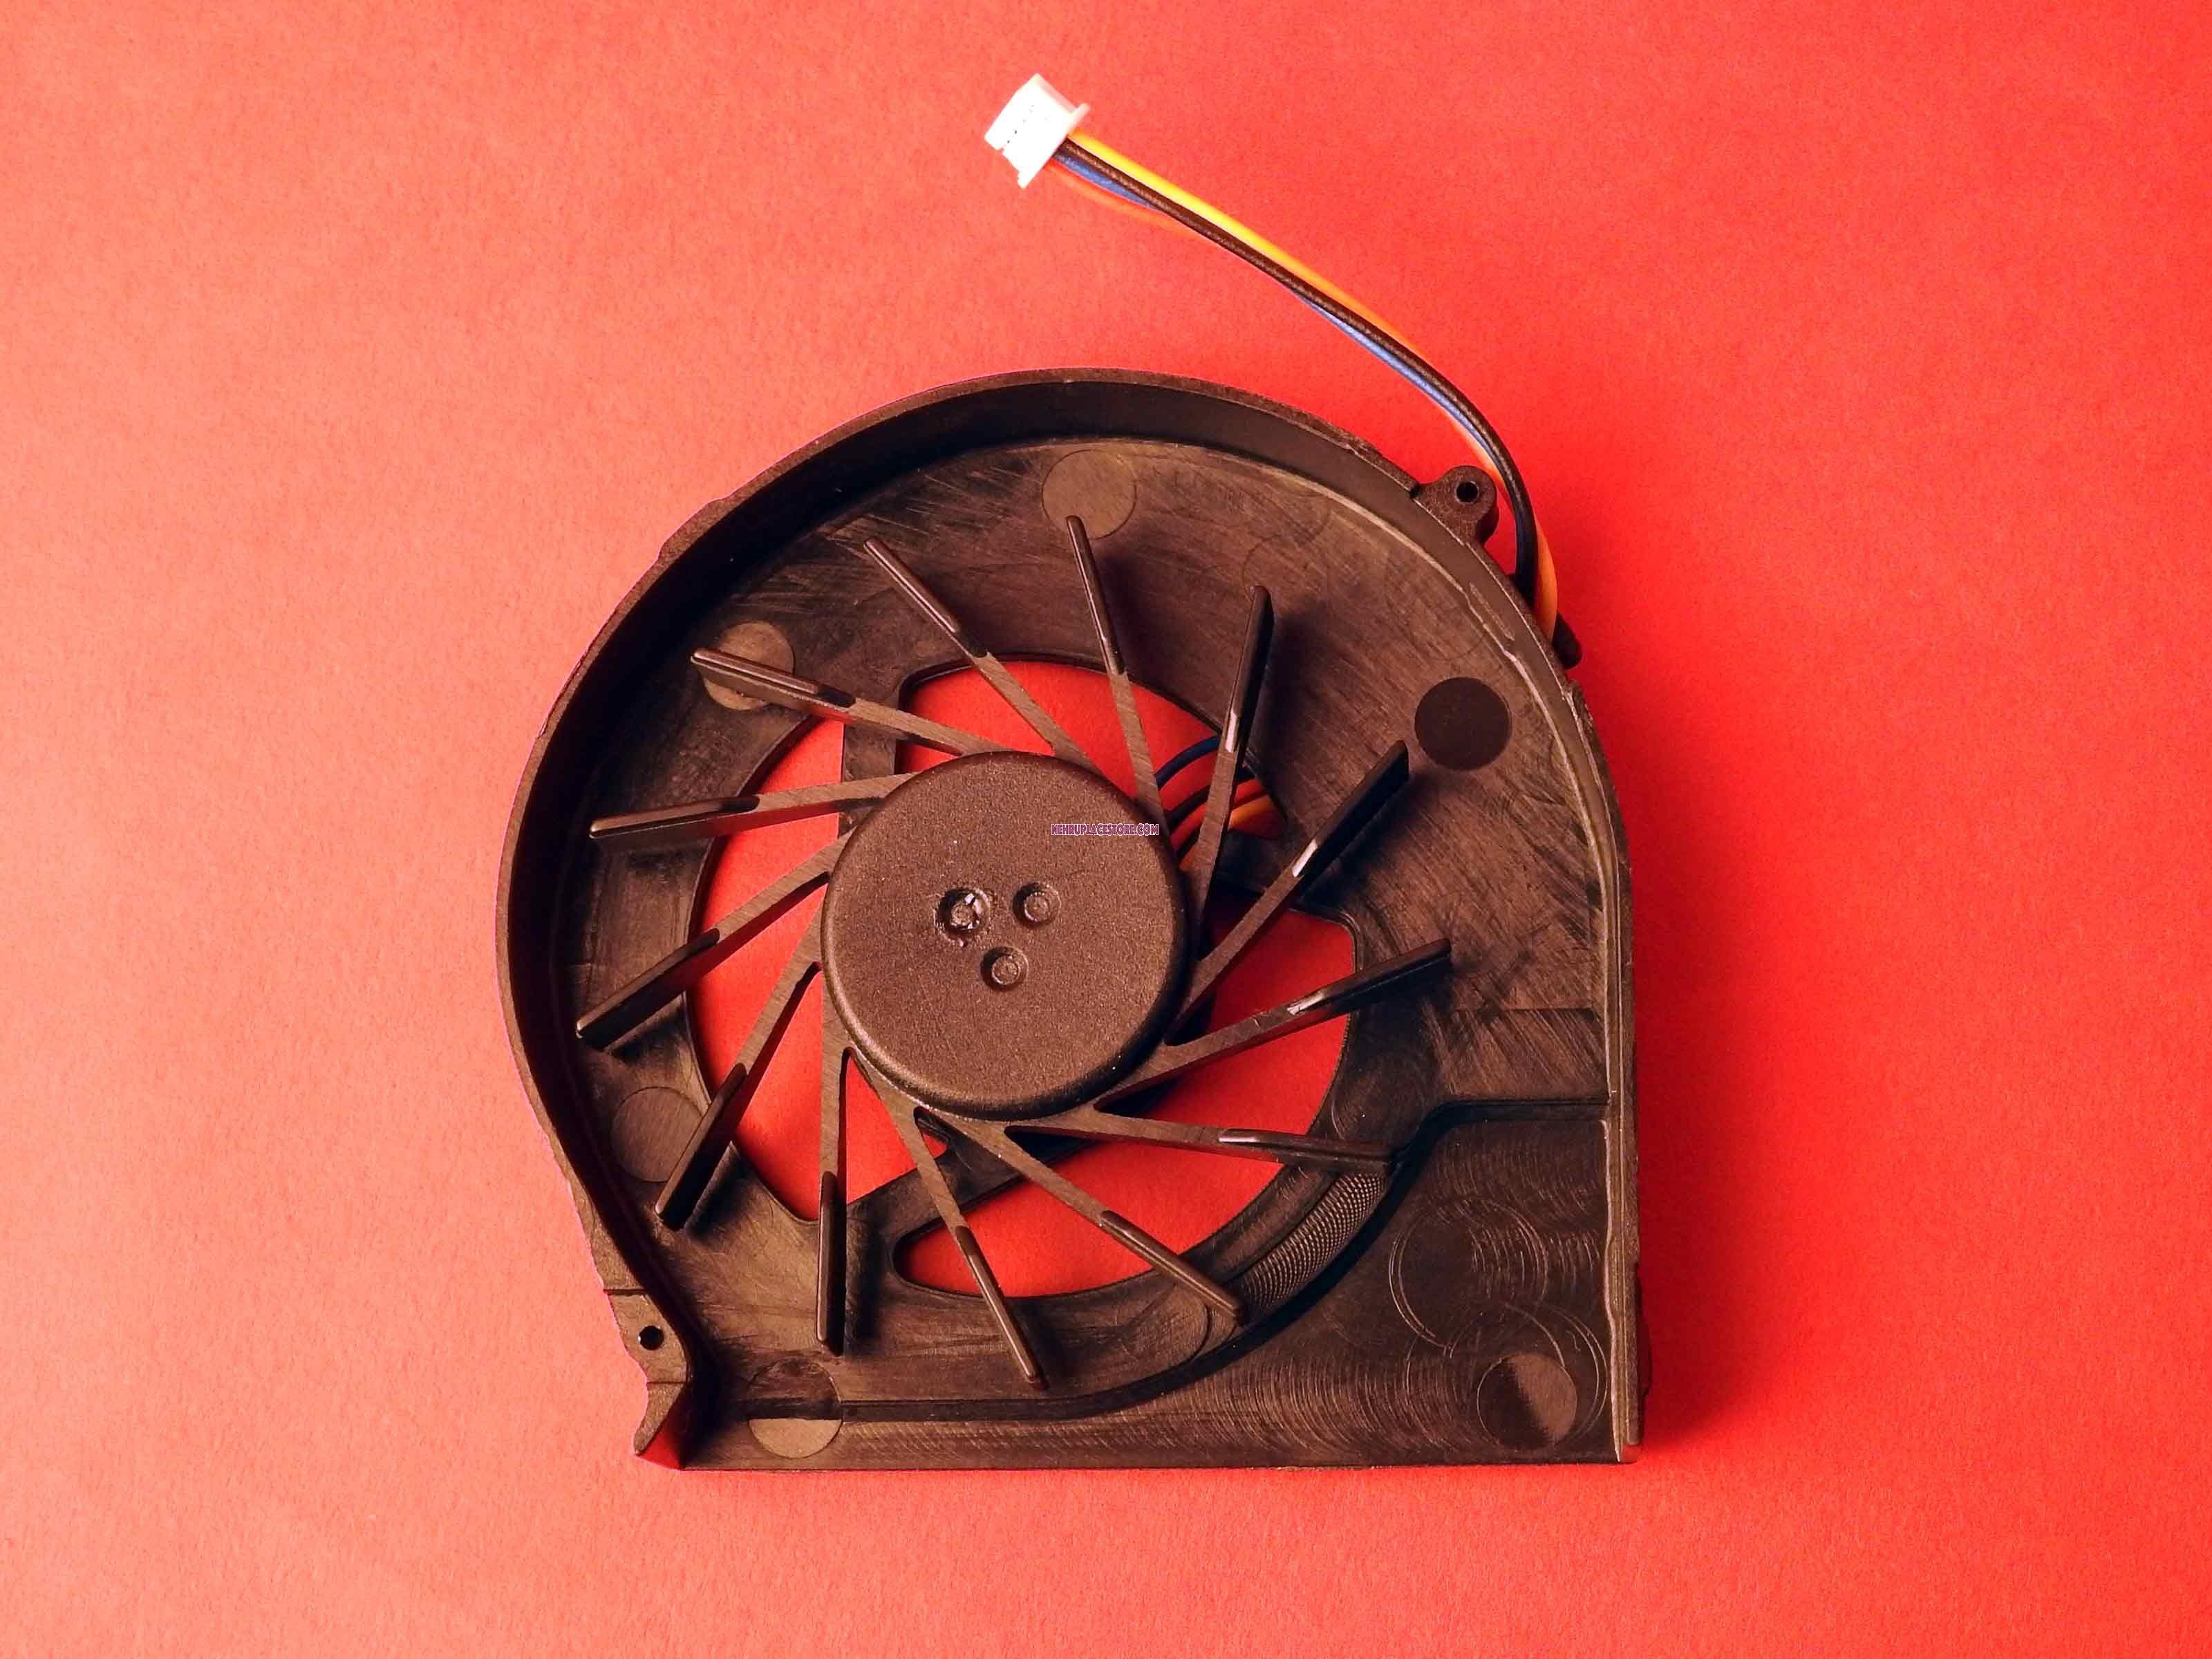 Original HP g6-2311nr g7-2251dx g6-2129nr Laptop CPU Fan 683193-001 680551-001